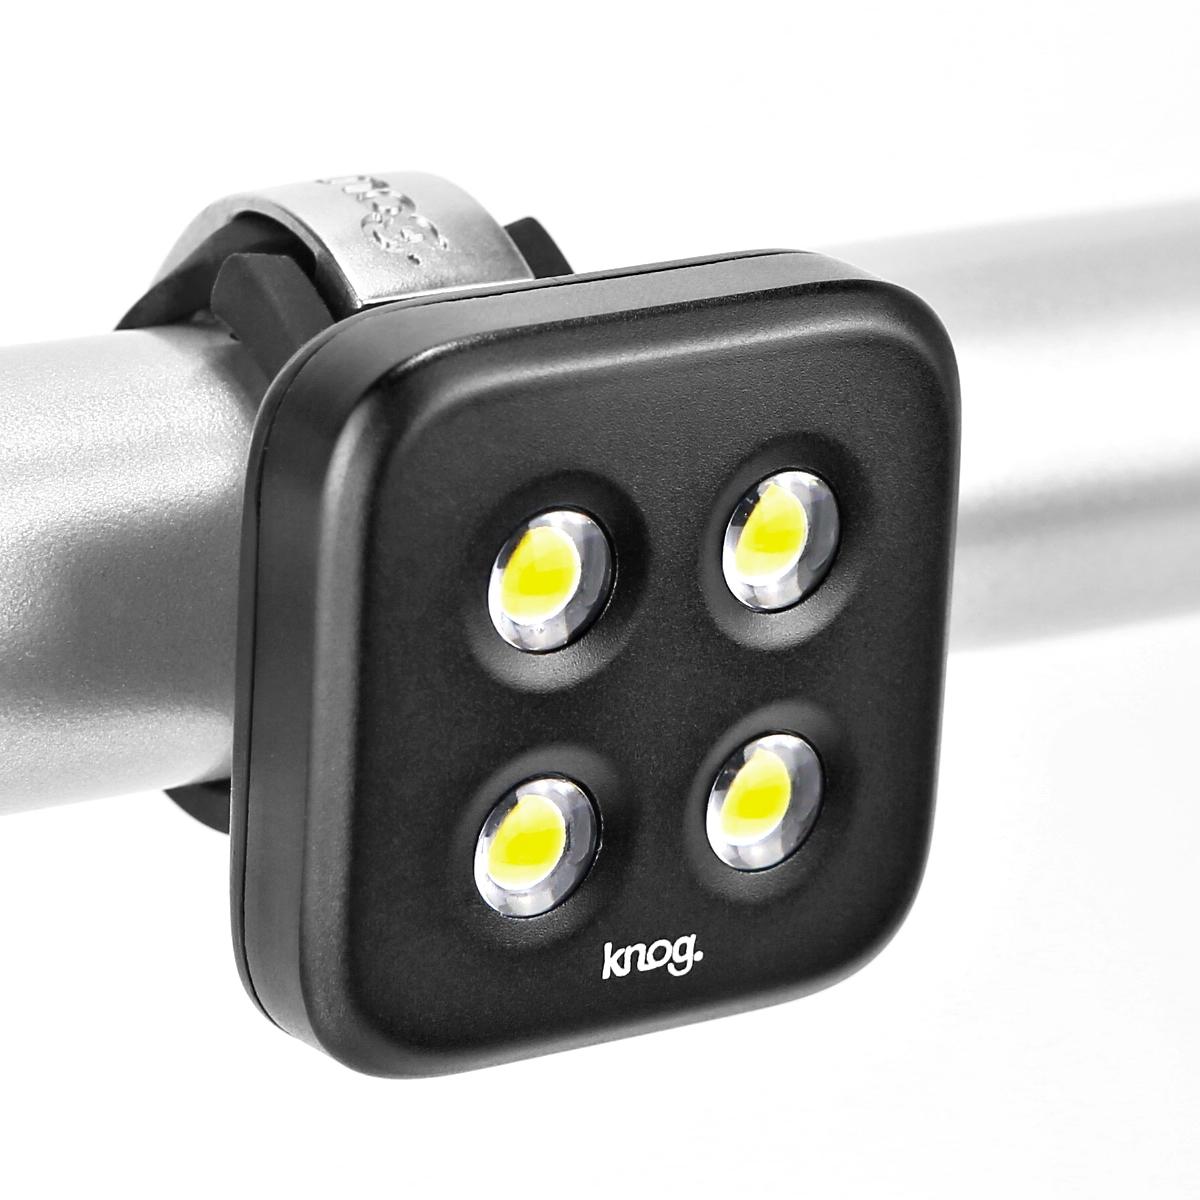 Éclairage arrière Knog Blinder Standard 4 LED - Argent